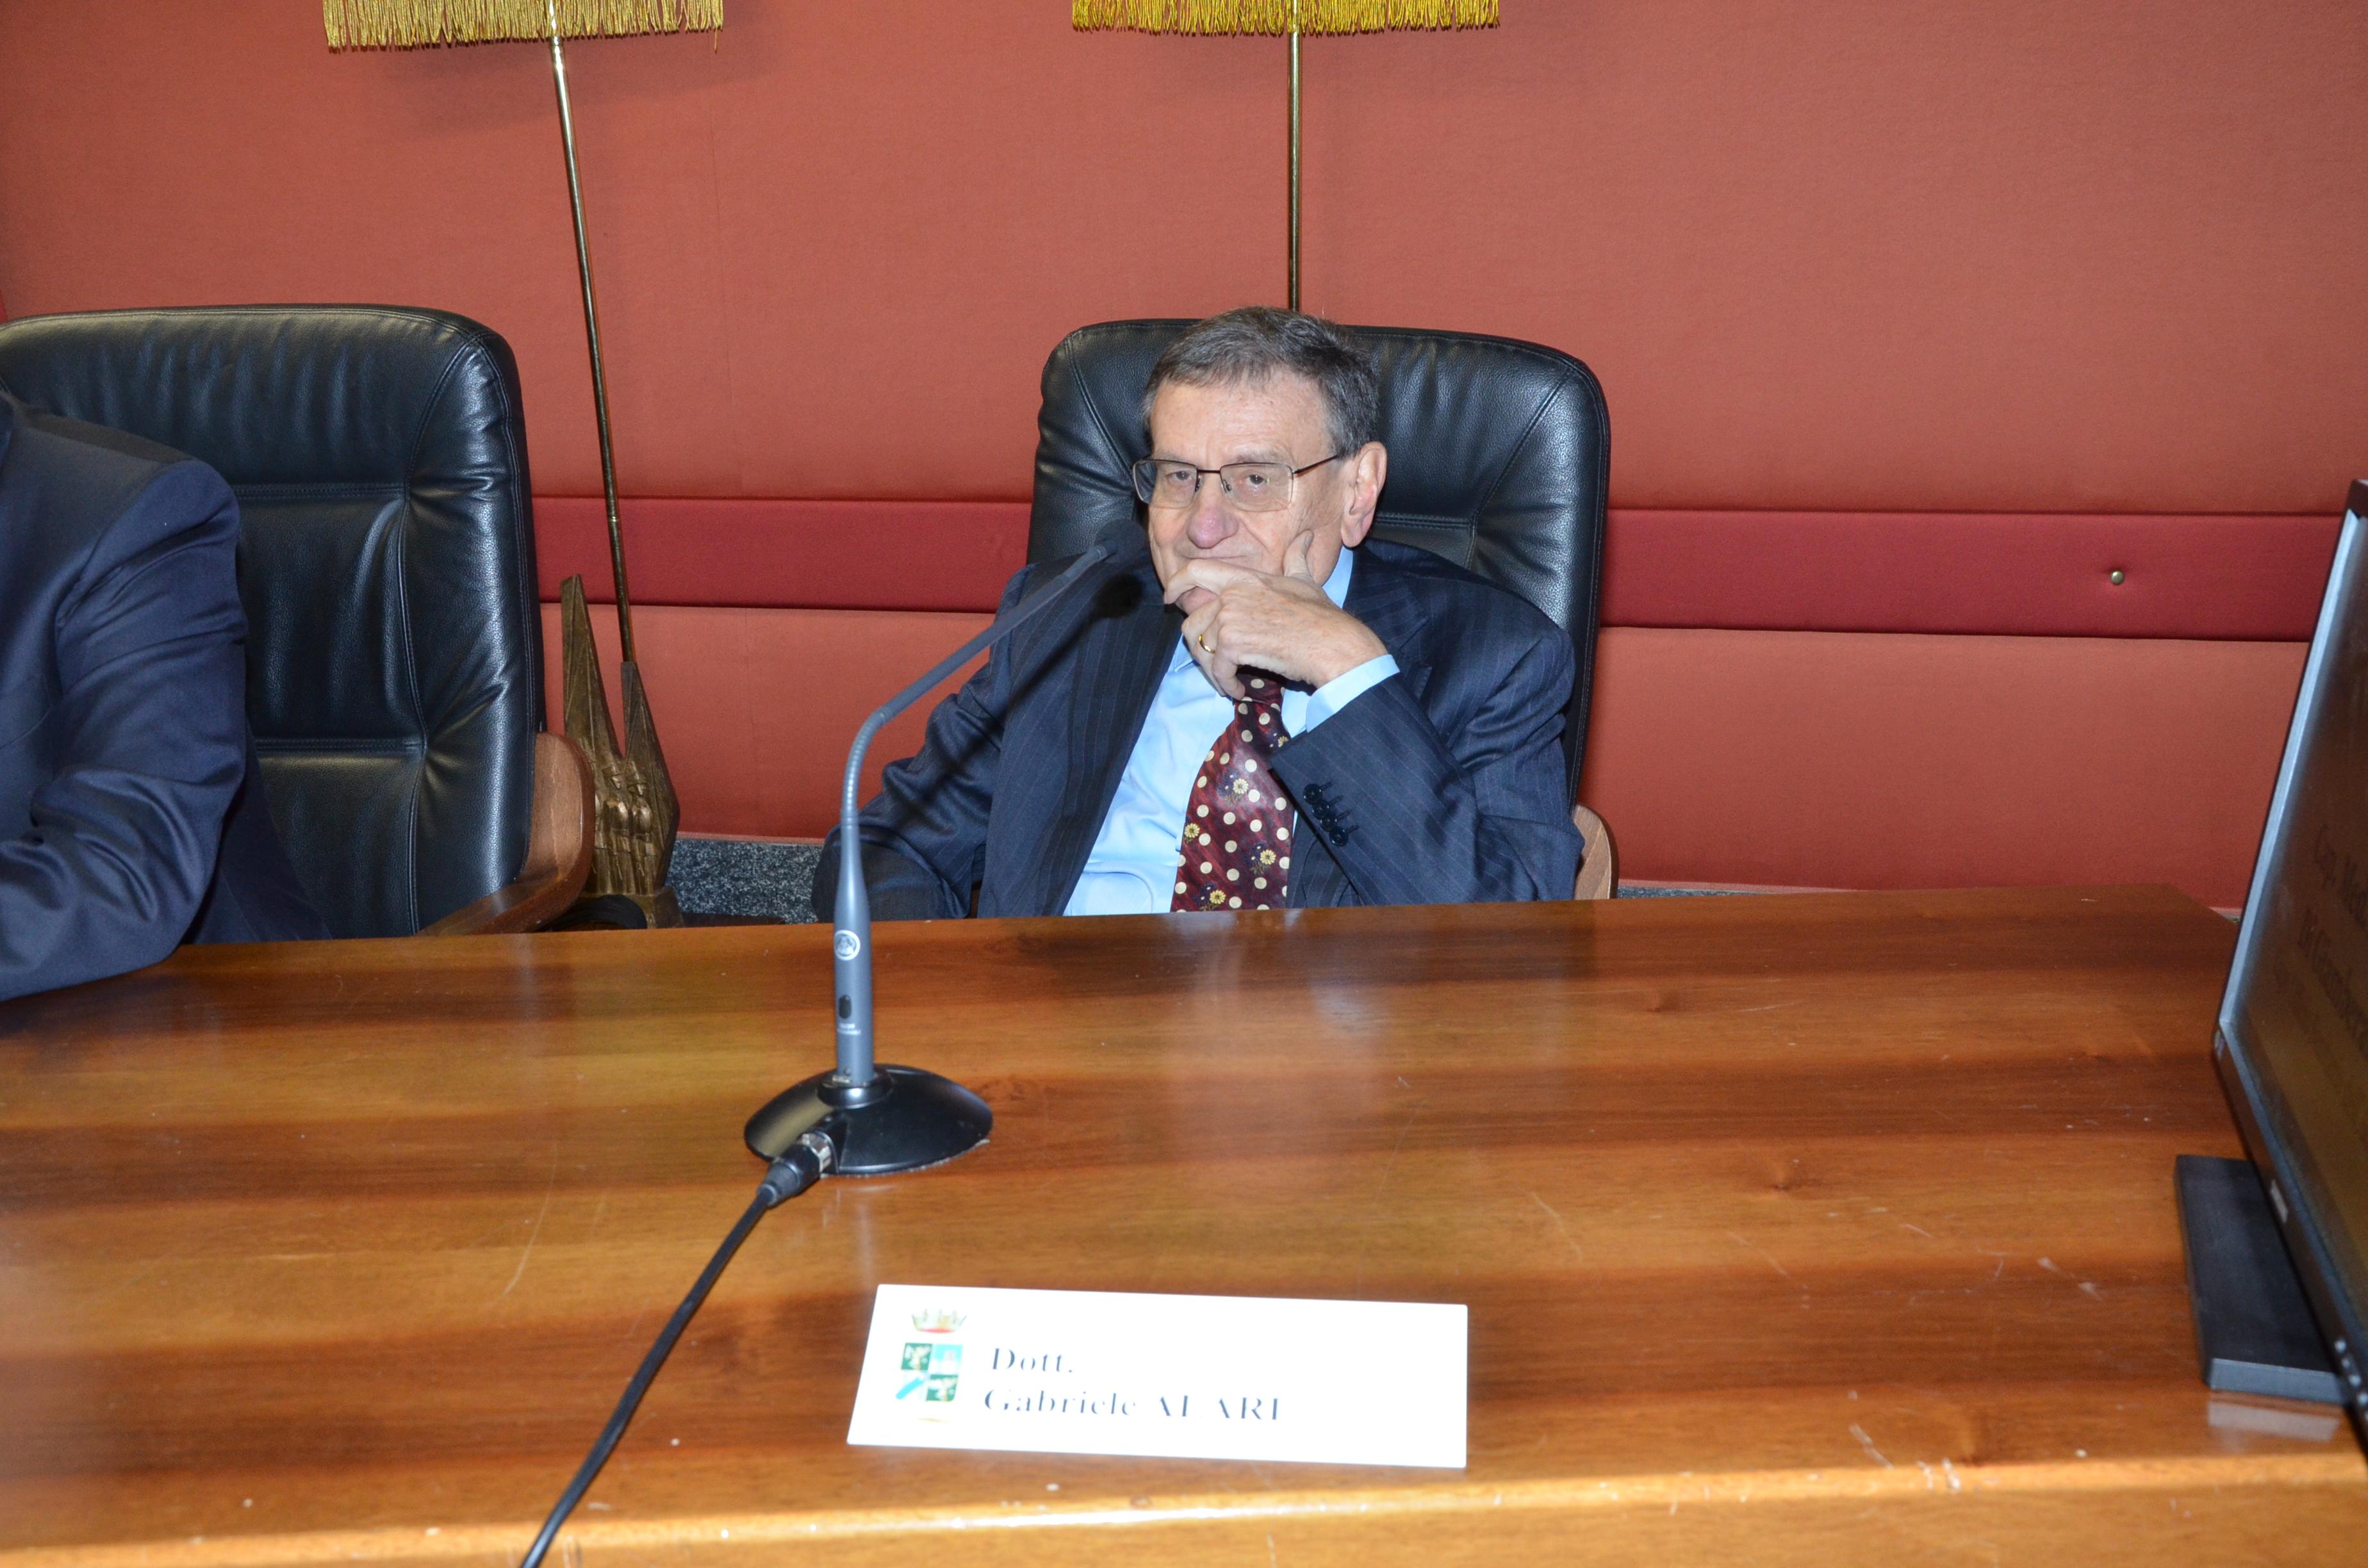 Dott. Gabriele Alari - Angiologo in Politerapica